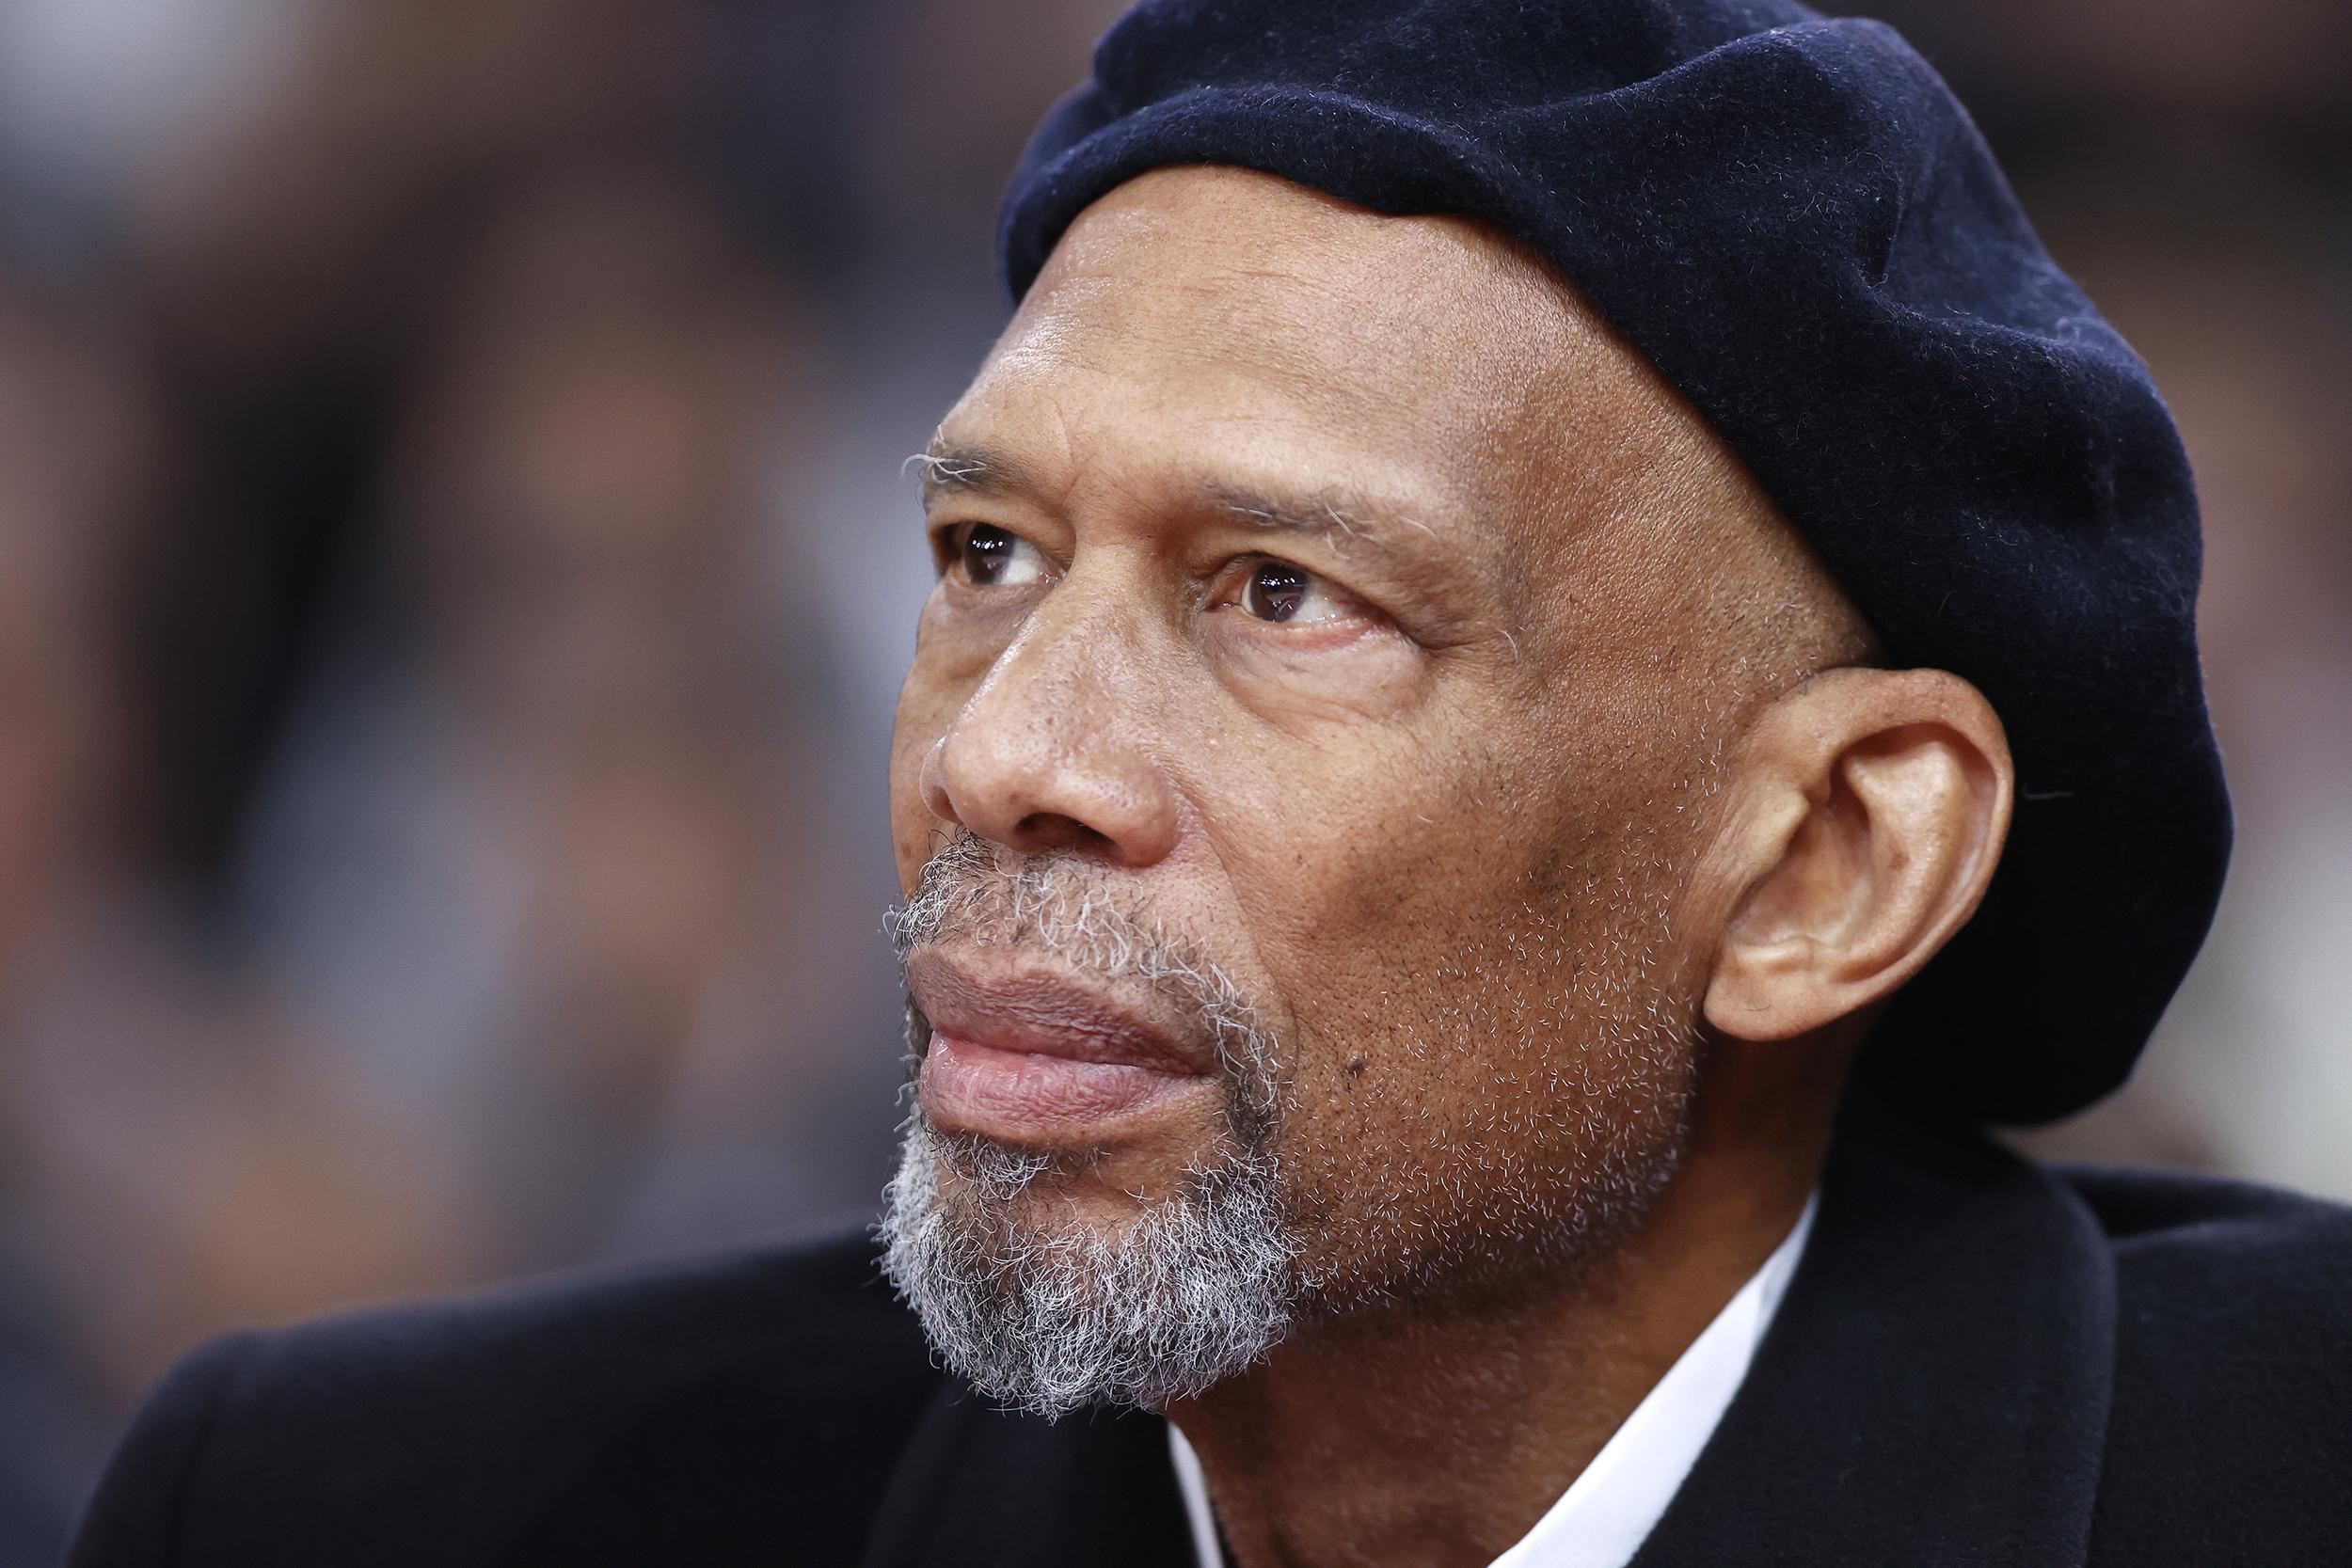 Kareem Abdul-Jabbar has no time for these NBA stars' Covid selfishness